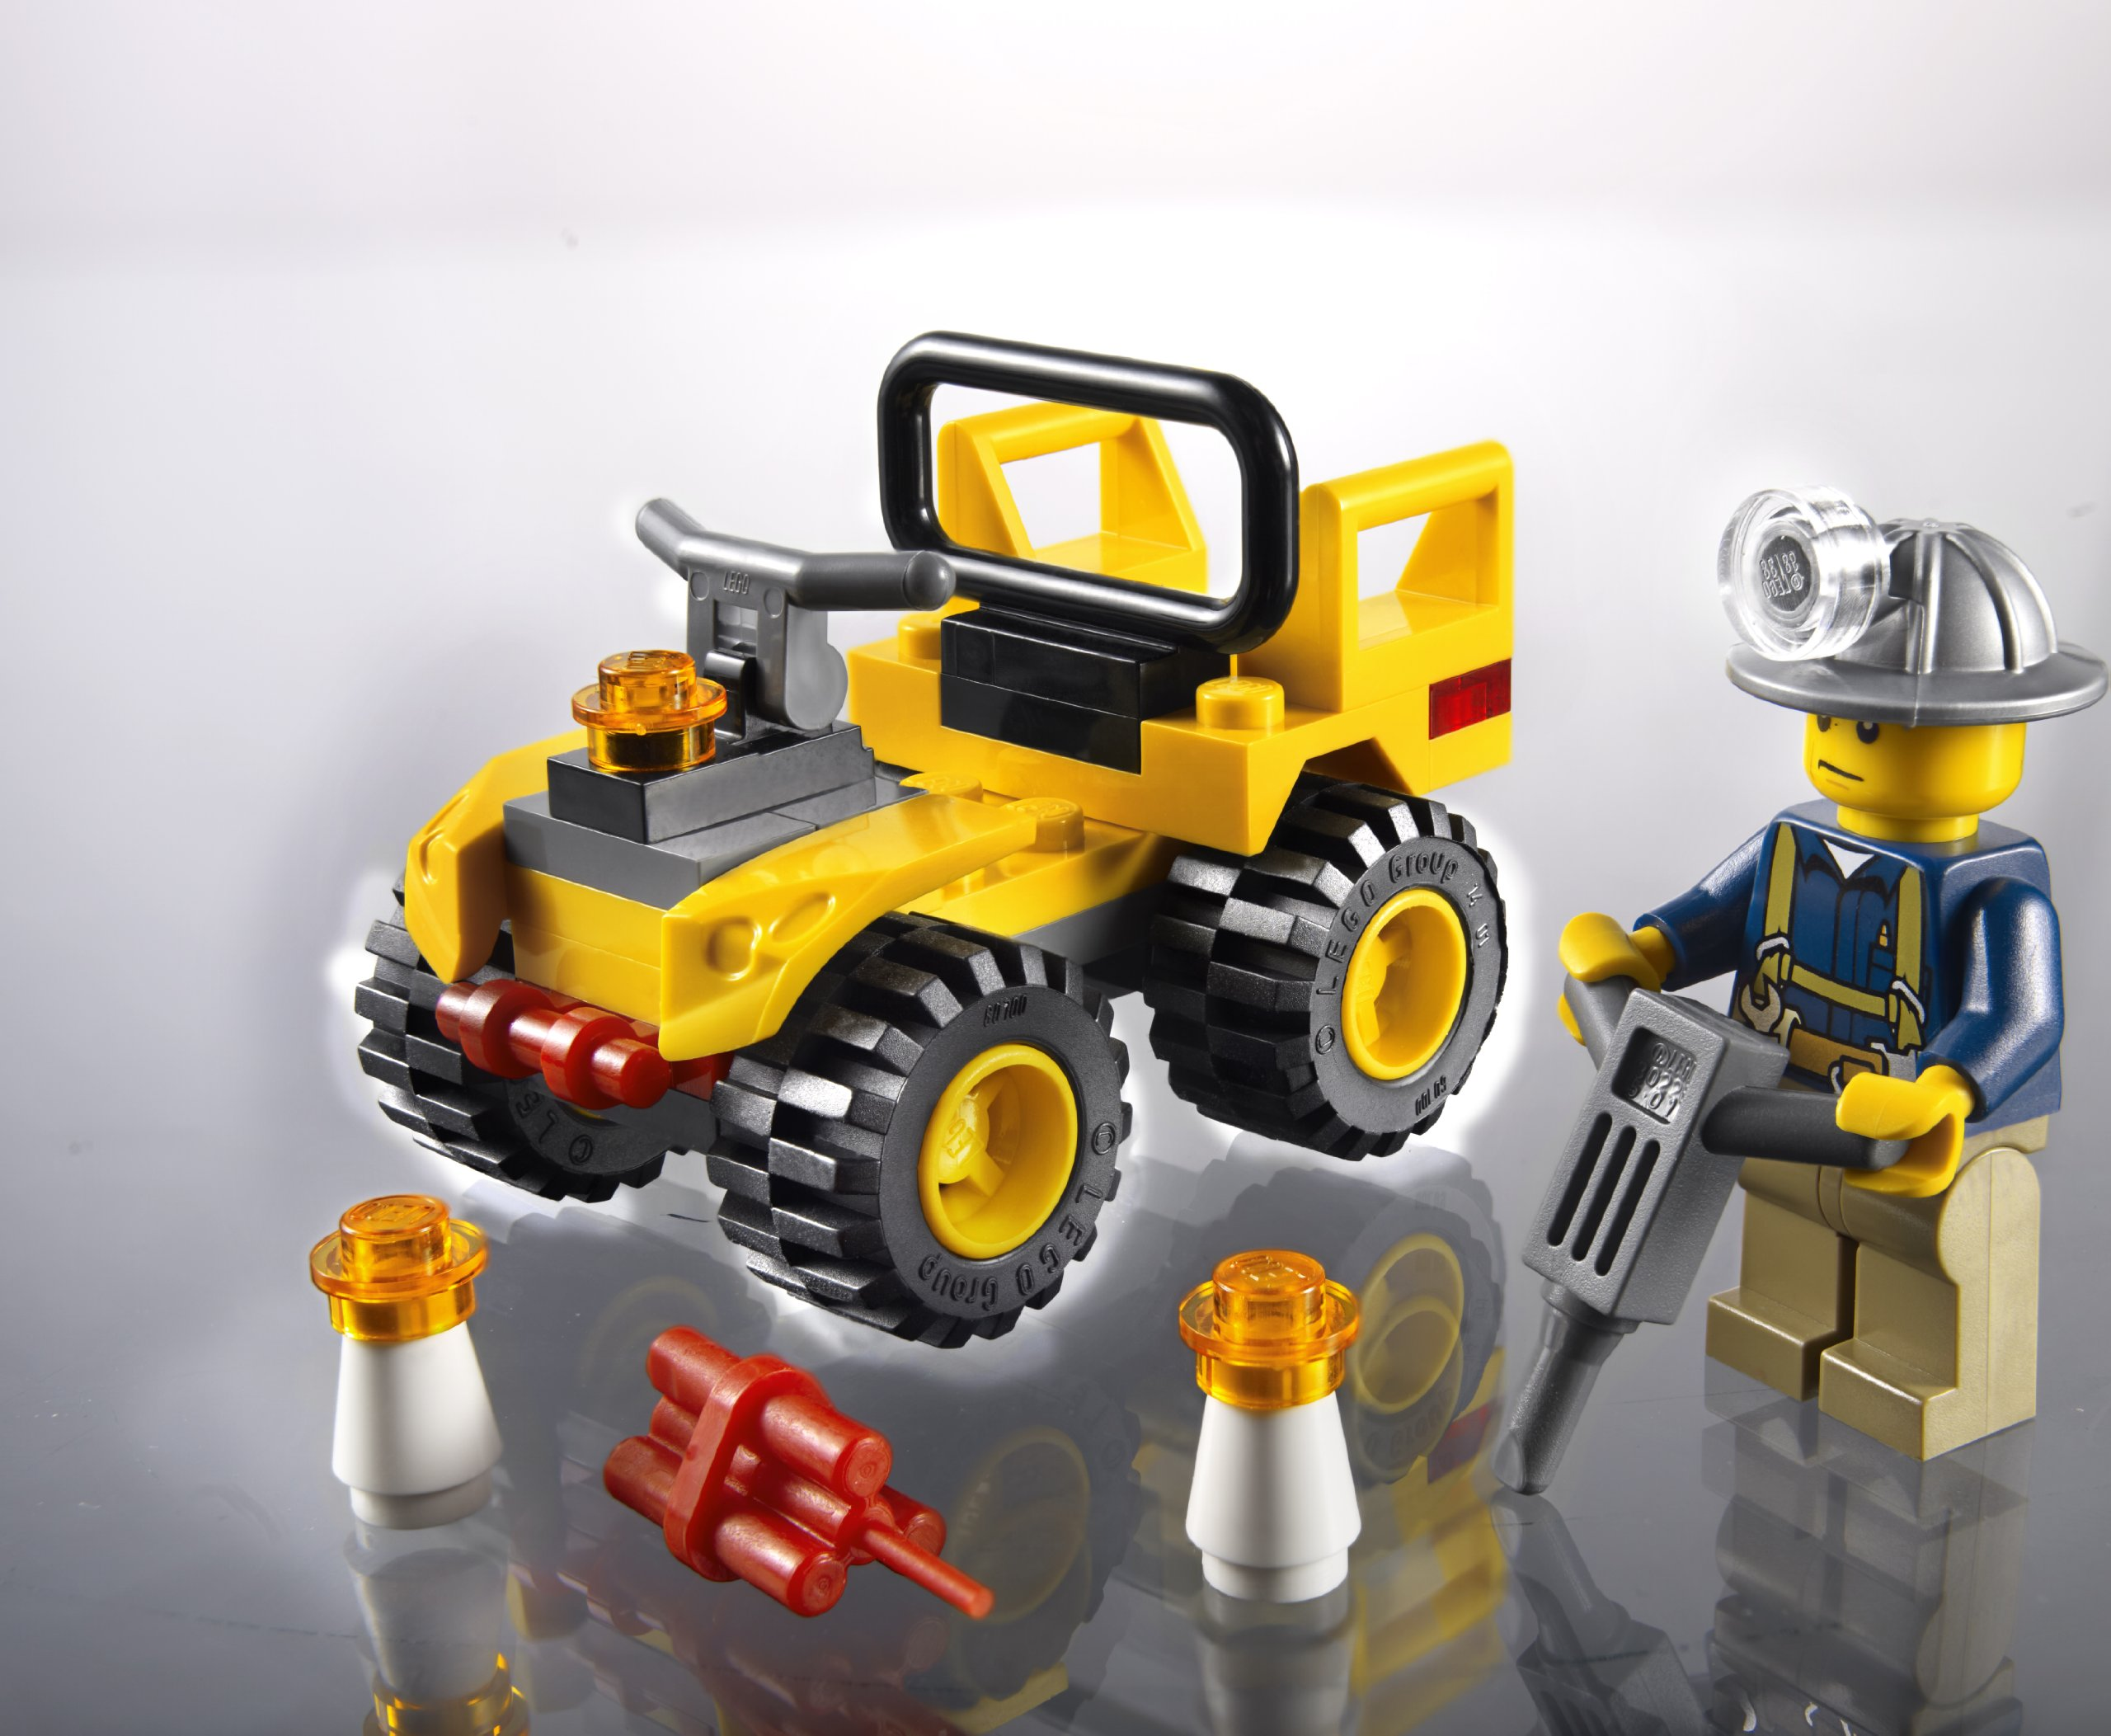 LEGO-City-Mining-Quad-Set-30152-Insaccato